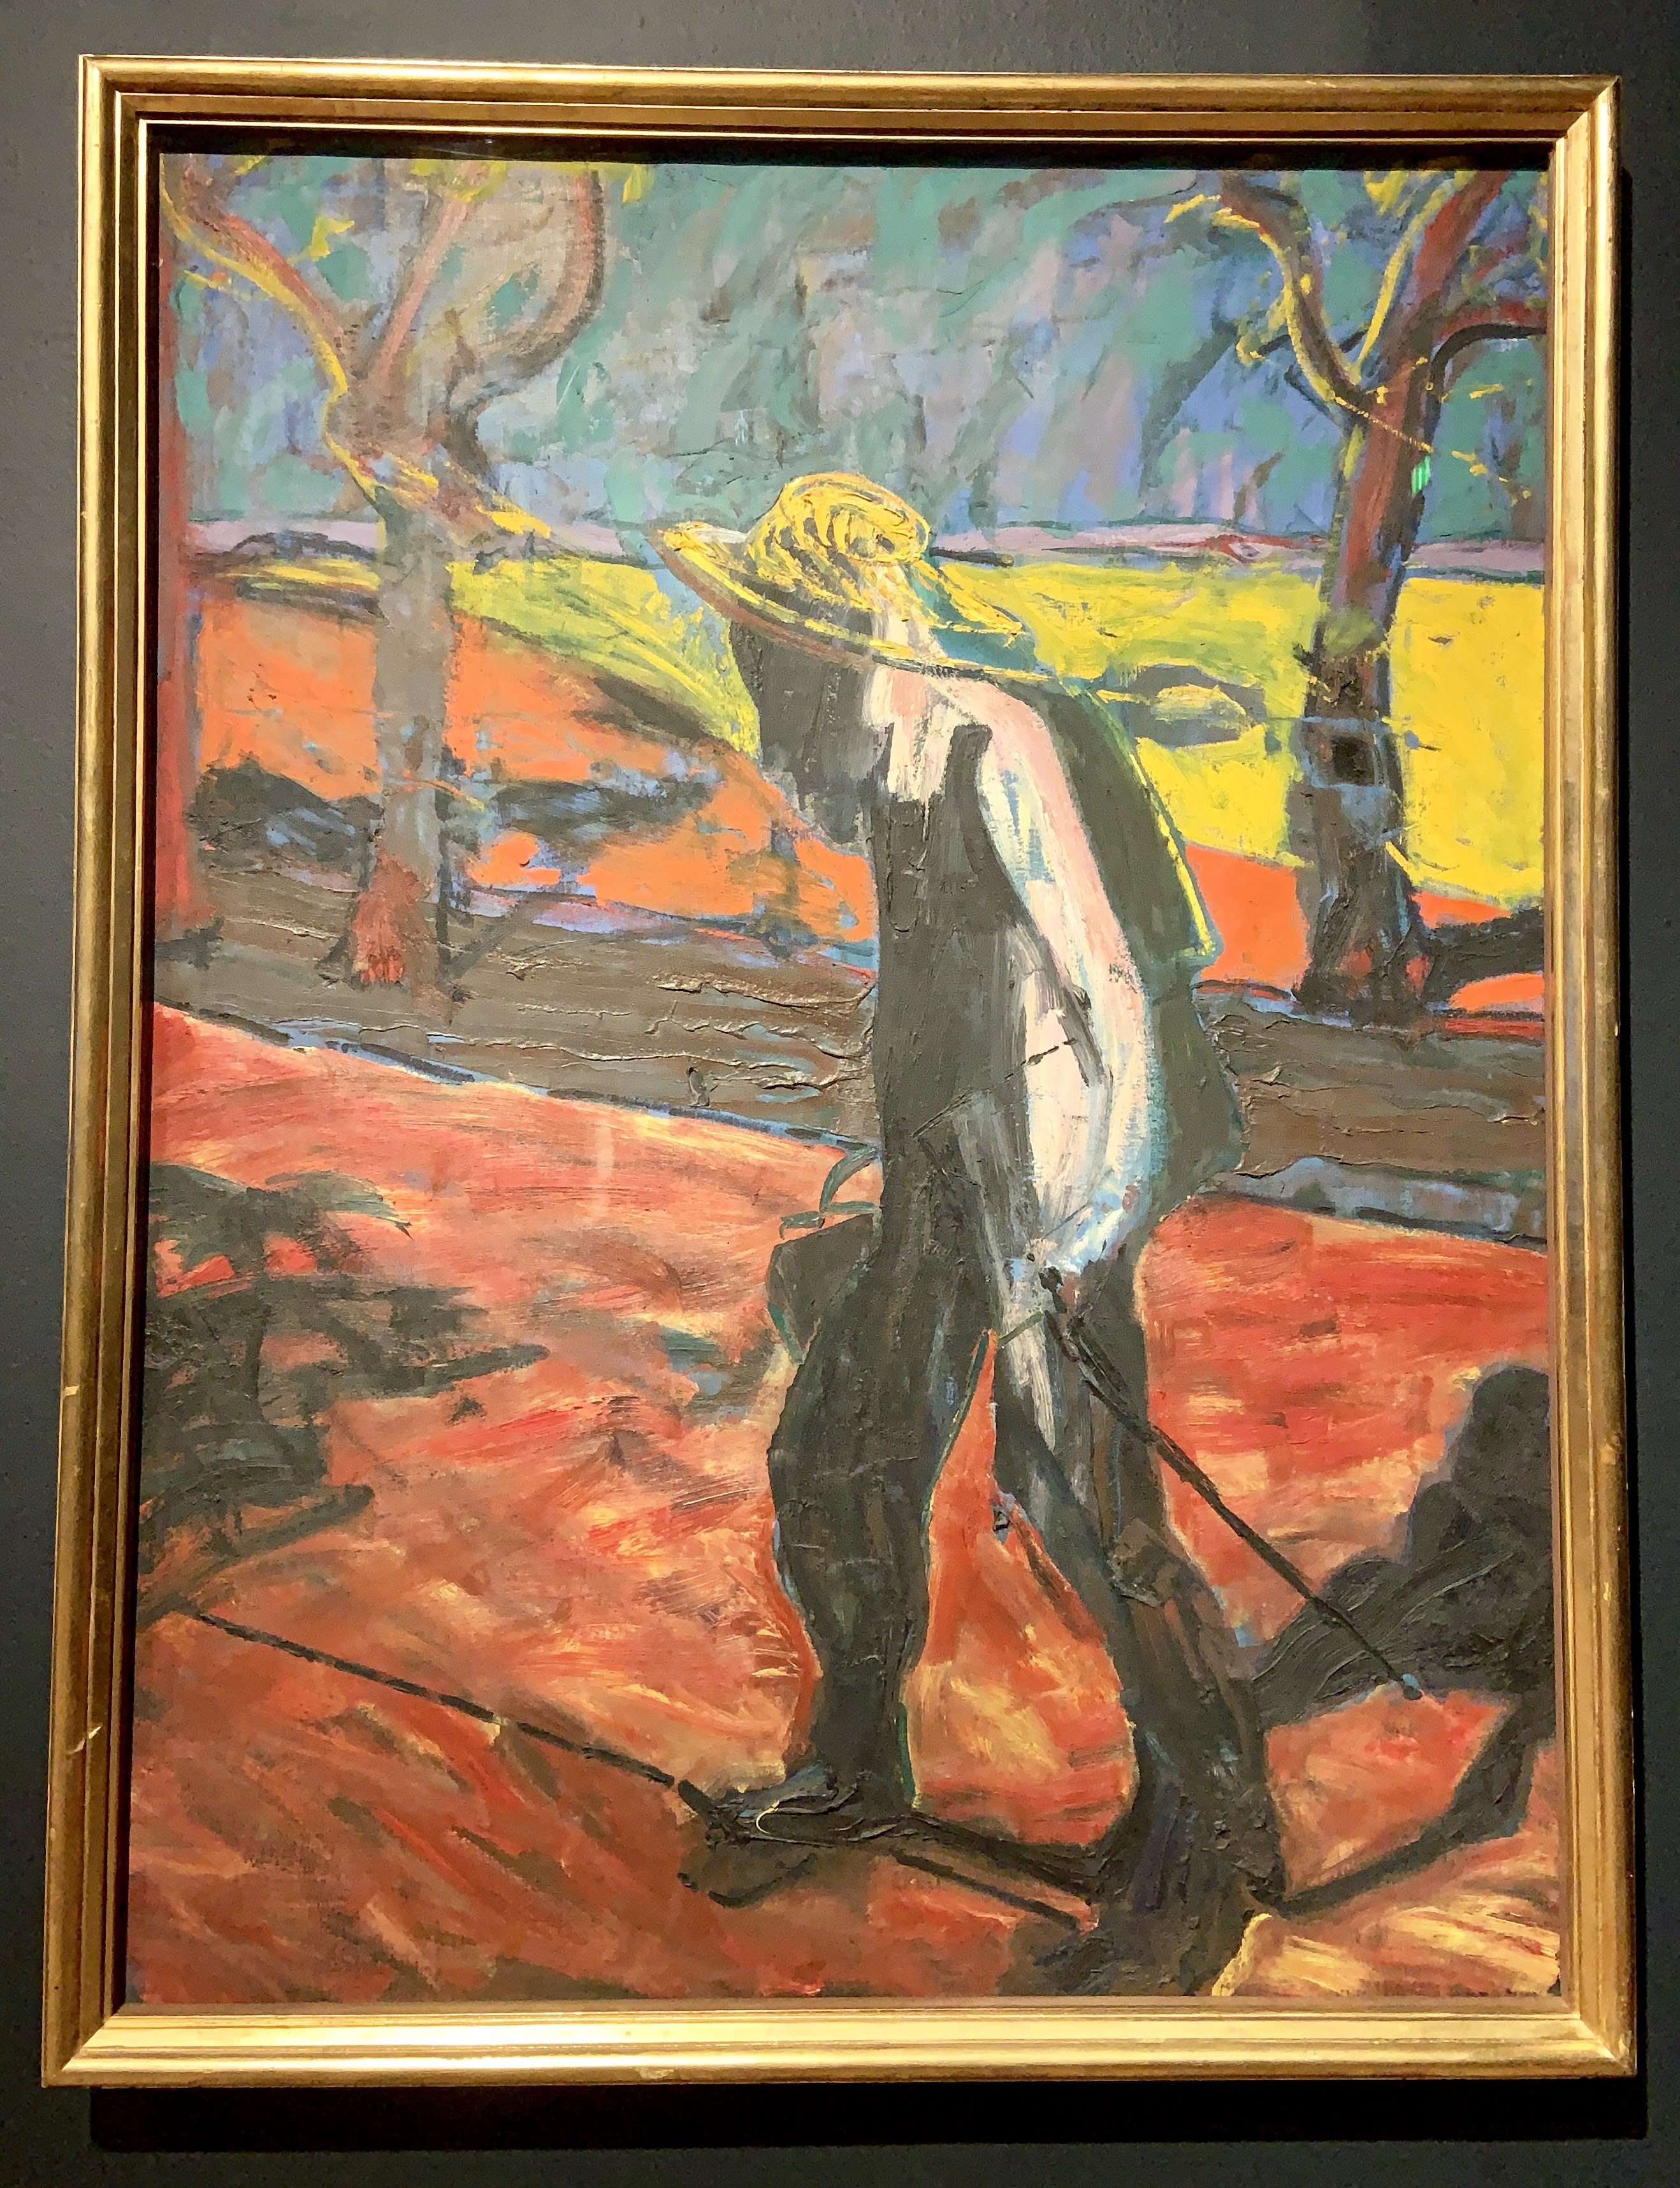 Francis Bacon - Study for Portrait of Van Gogh VI, 1957